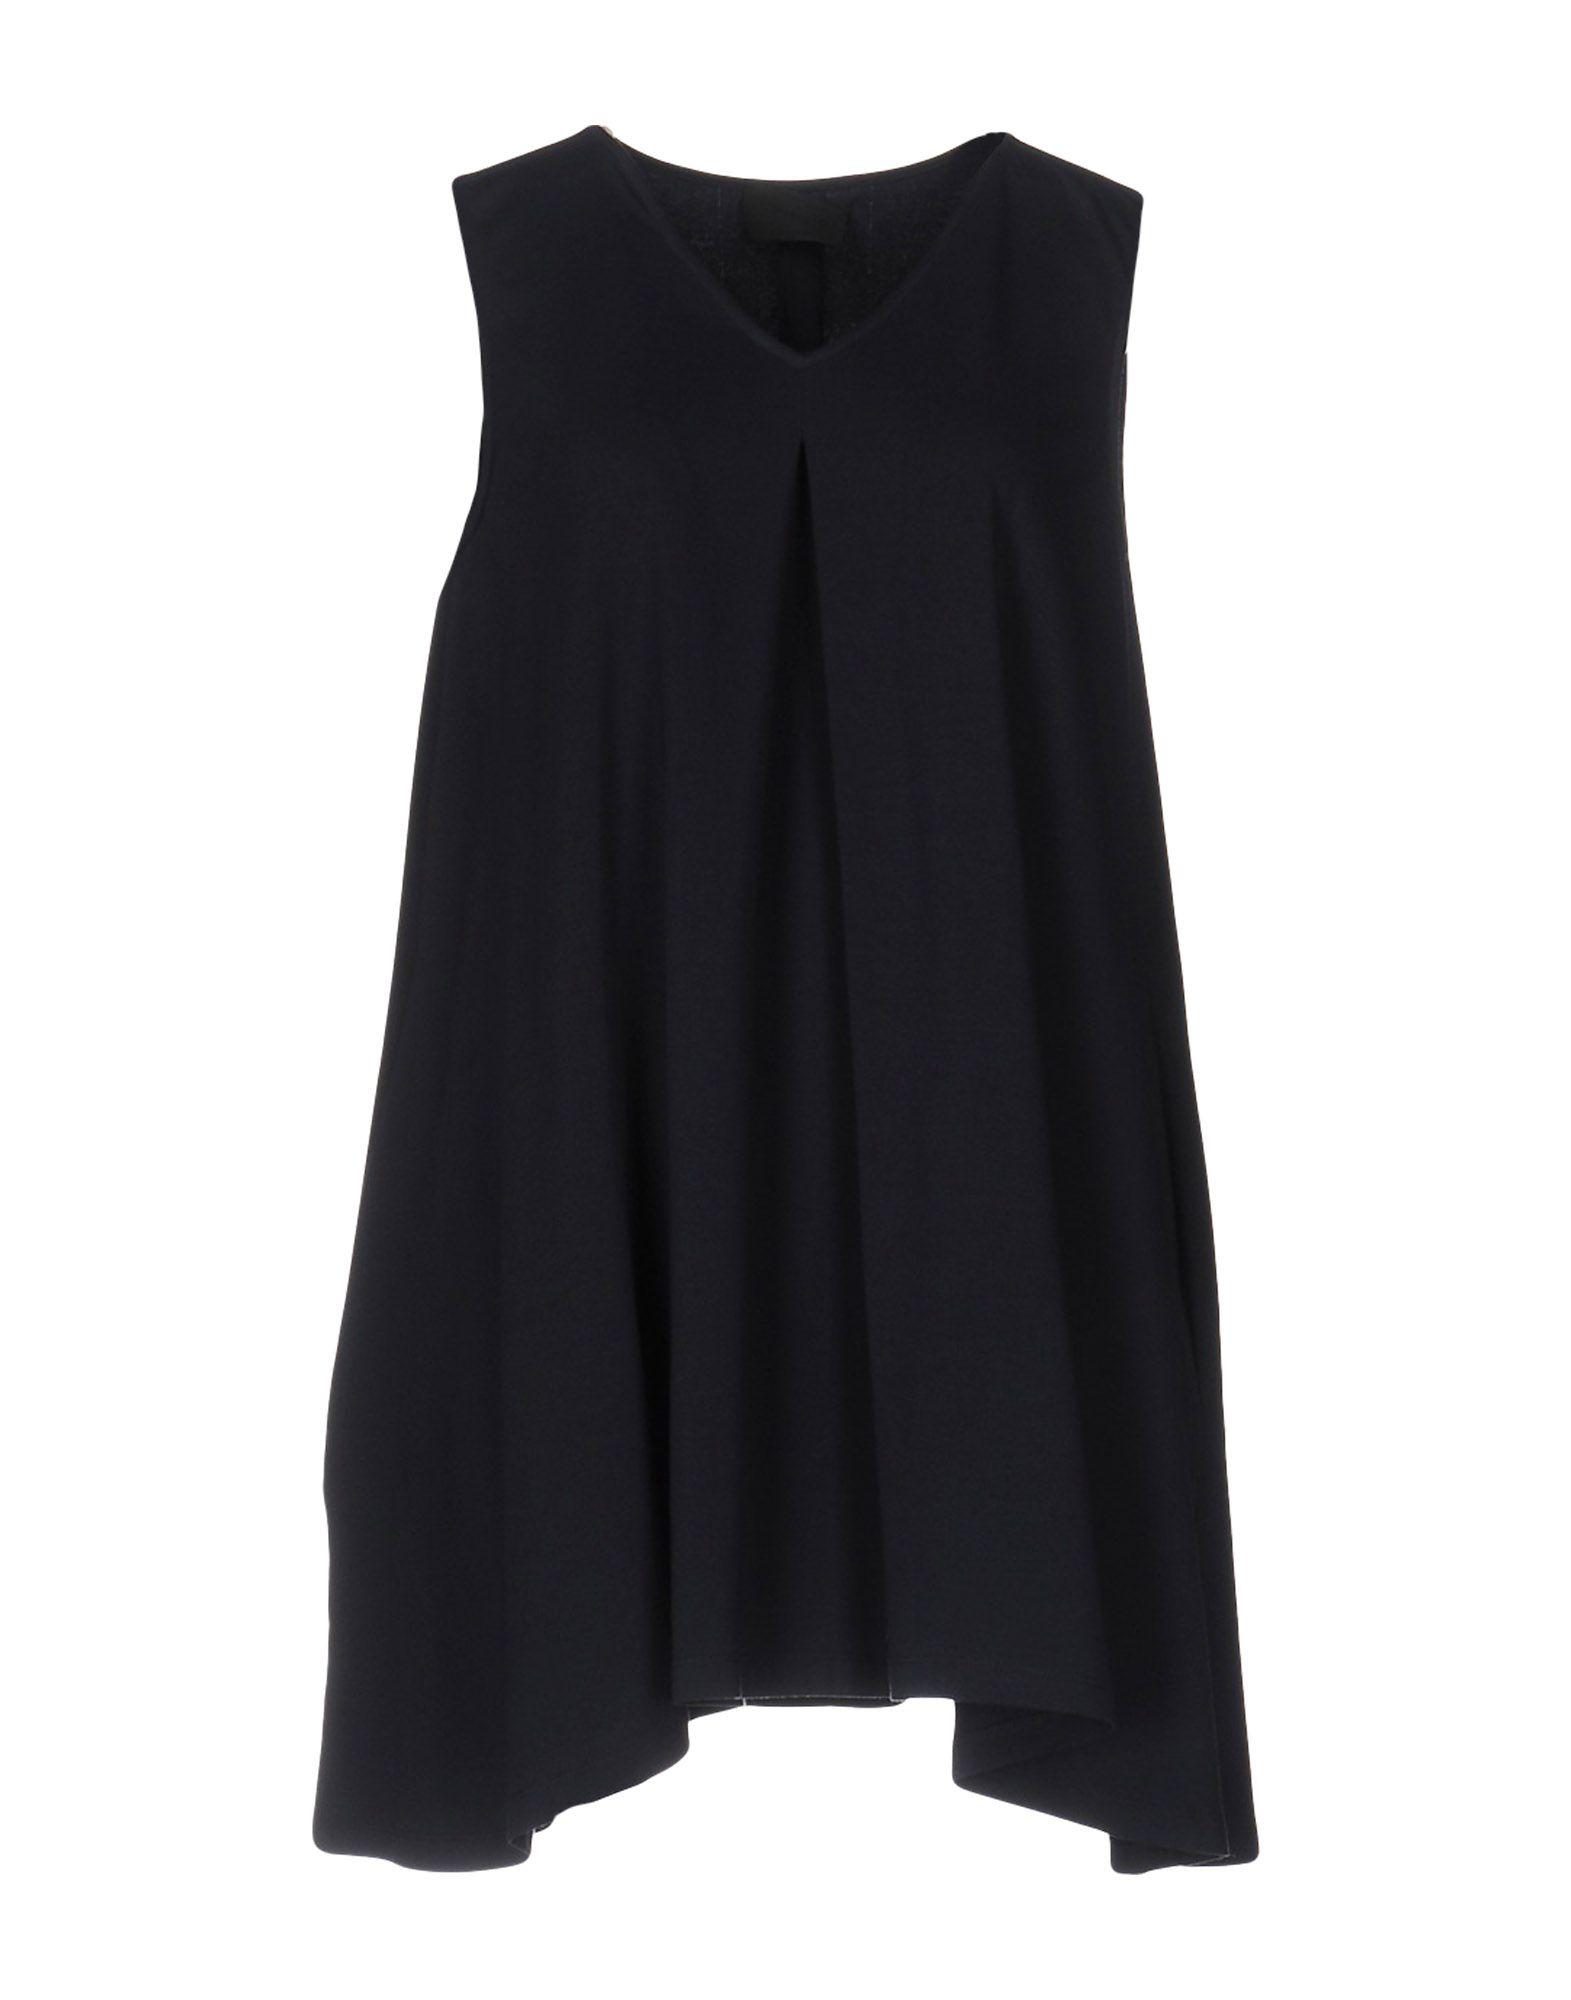 SONIA SPECIALE Короткое платье apriori bm500806f speciale 500х80 6 секций